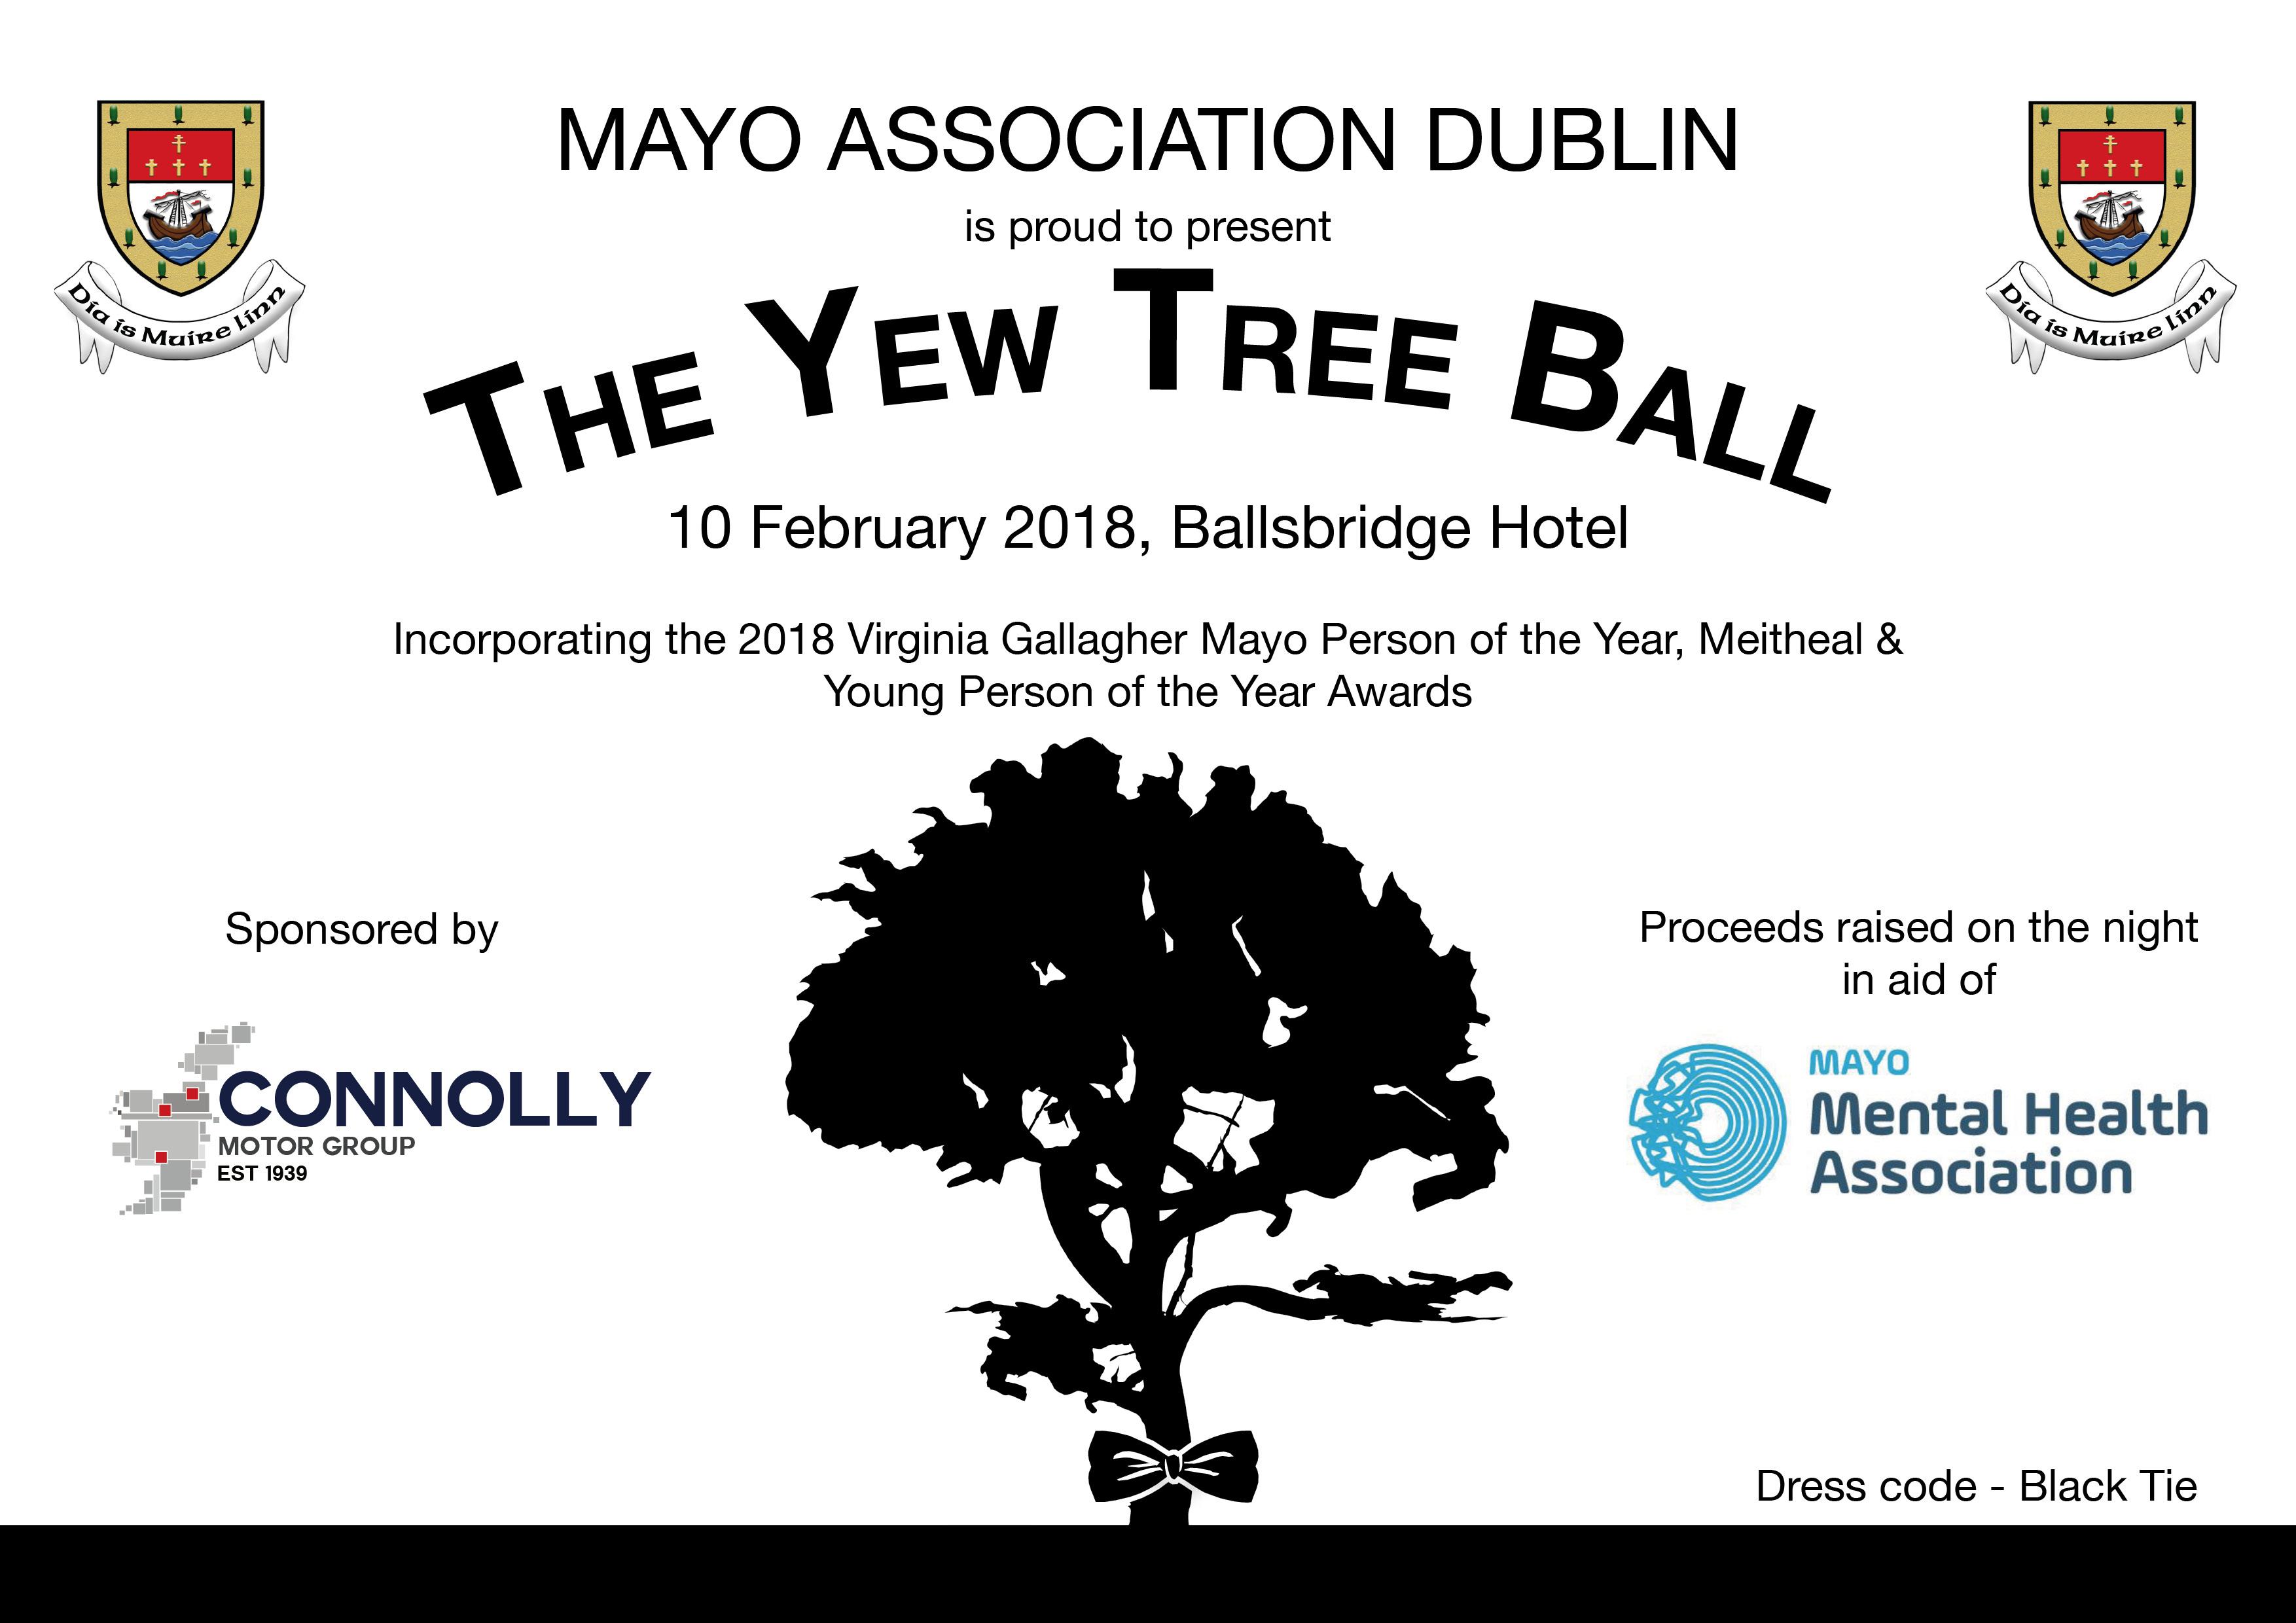 MAD Yew Tree Ball - Mayo Association of Dublin